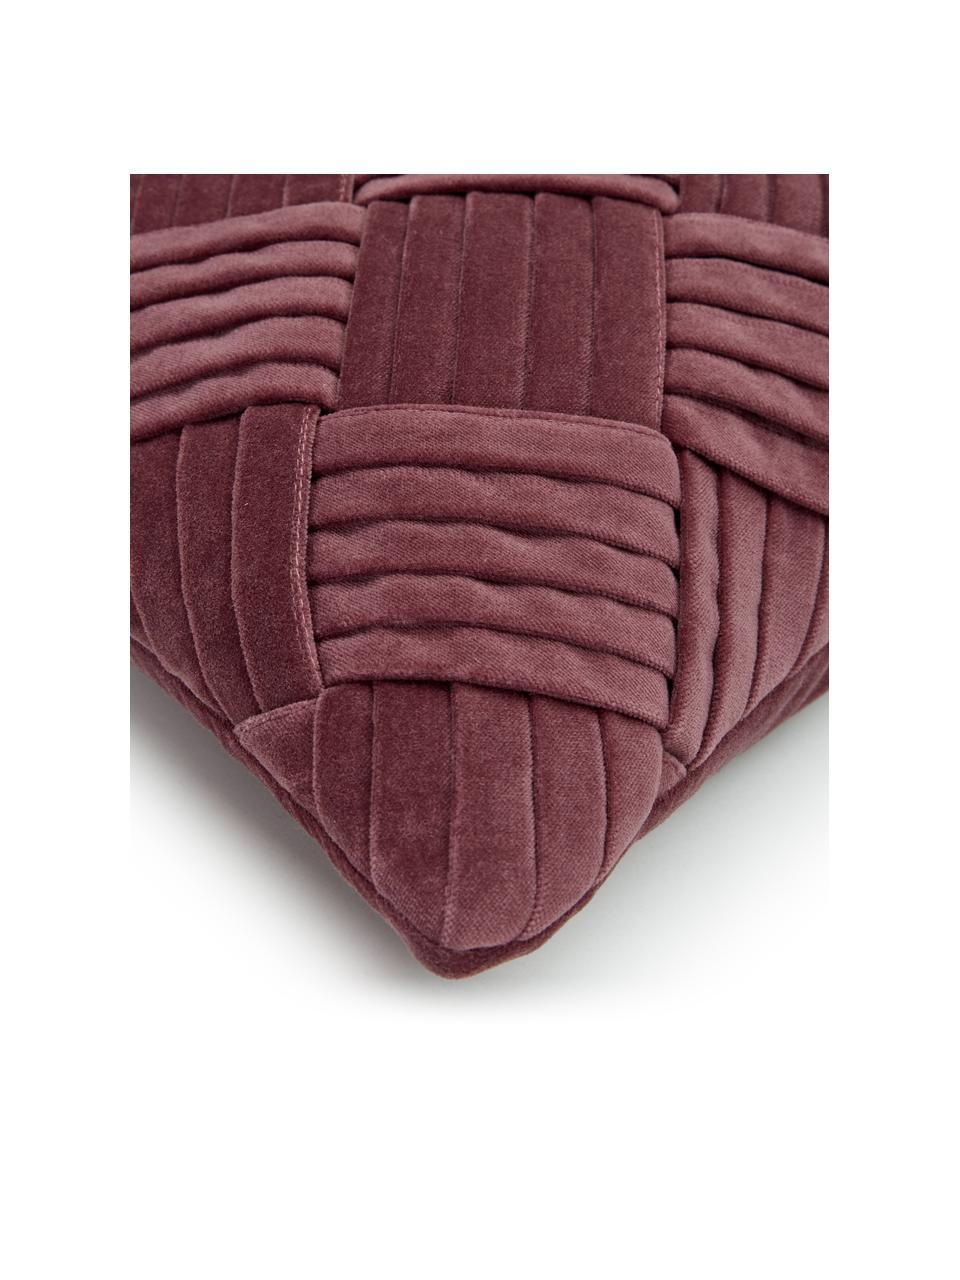 Samt-Kissenhülle Sina in Altrosa mit Strukturmuster, Samt (100% Baumwolle), Rosa, 30 x 50 cm